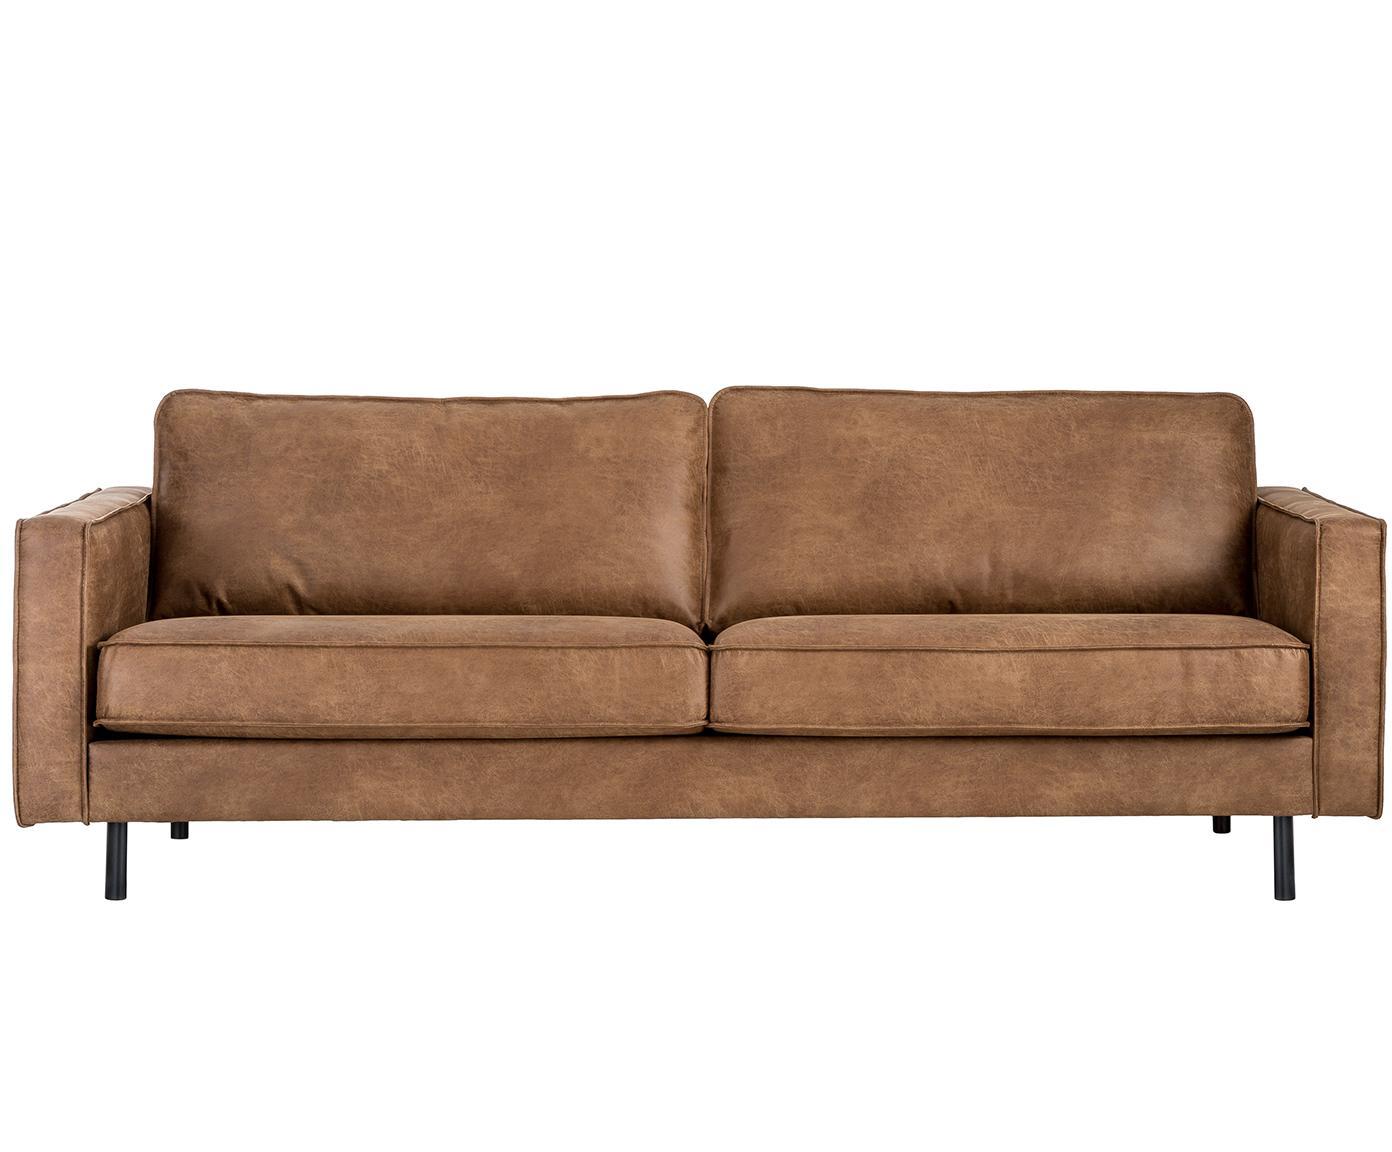 Leder-Sofa Hunter (3-Sitzer), Bezug: 70% recyceltes Leder, 30%, Gestell: Massives Birkenholz und h, Füße: Metall, pulverbeschichtet, Leder Braun, B 219 x T 90 cm